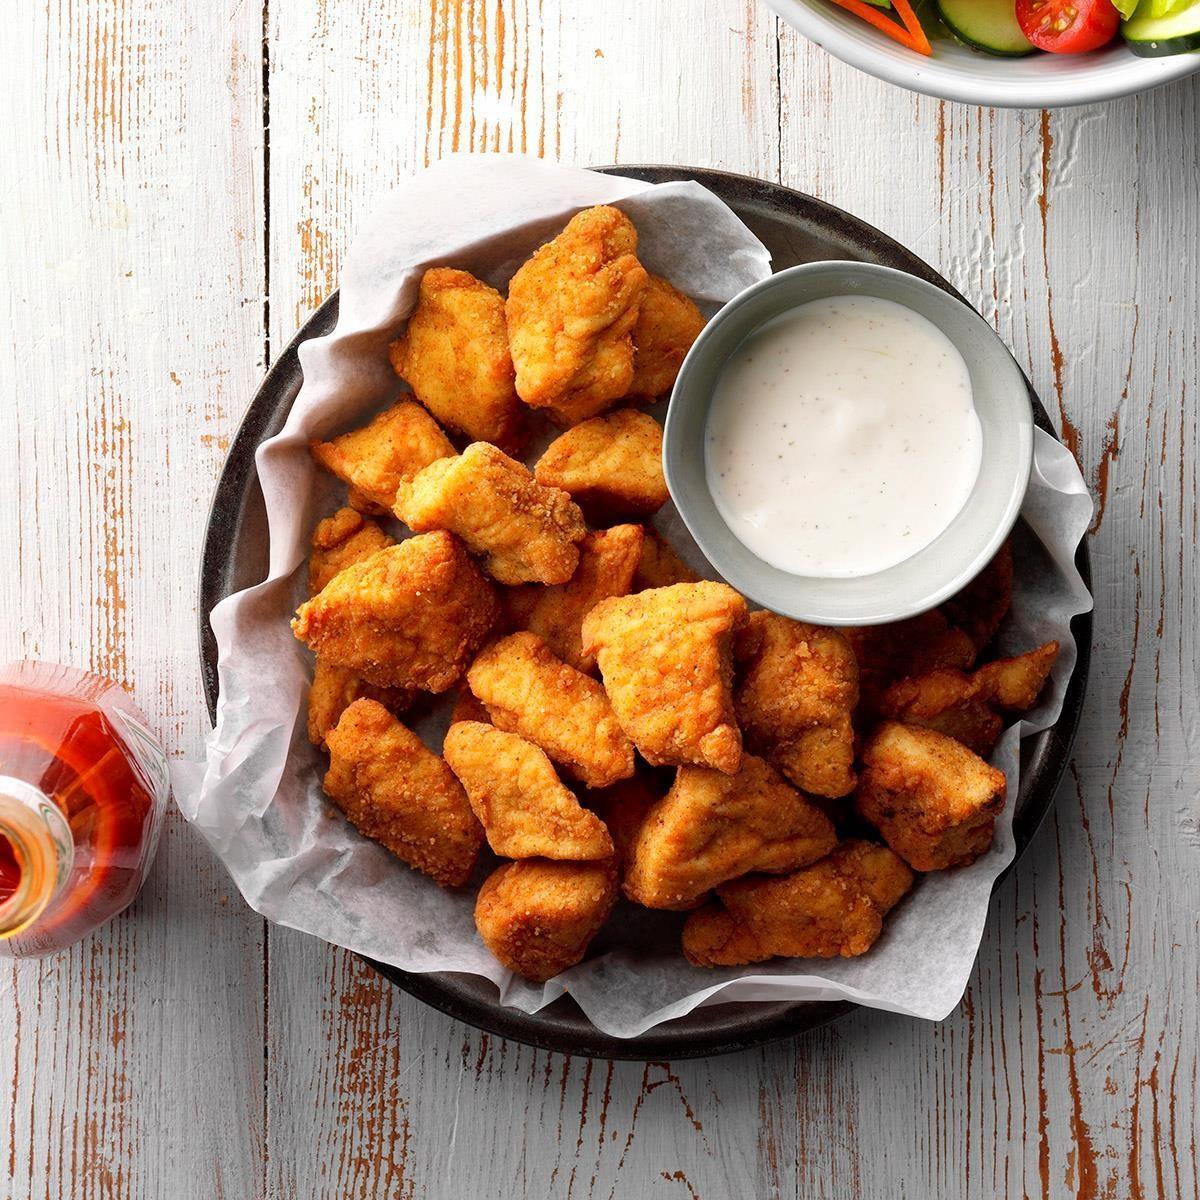 Chicken Nuggets Recipe | Taste of Home